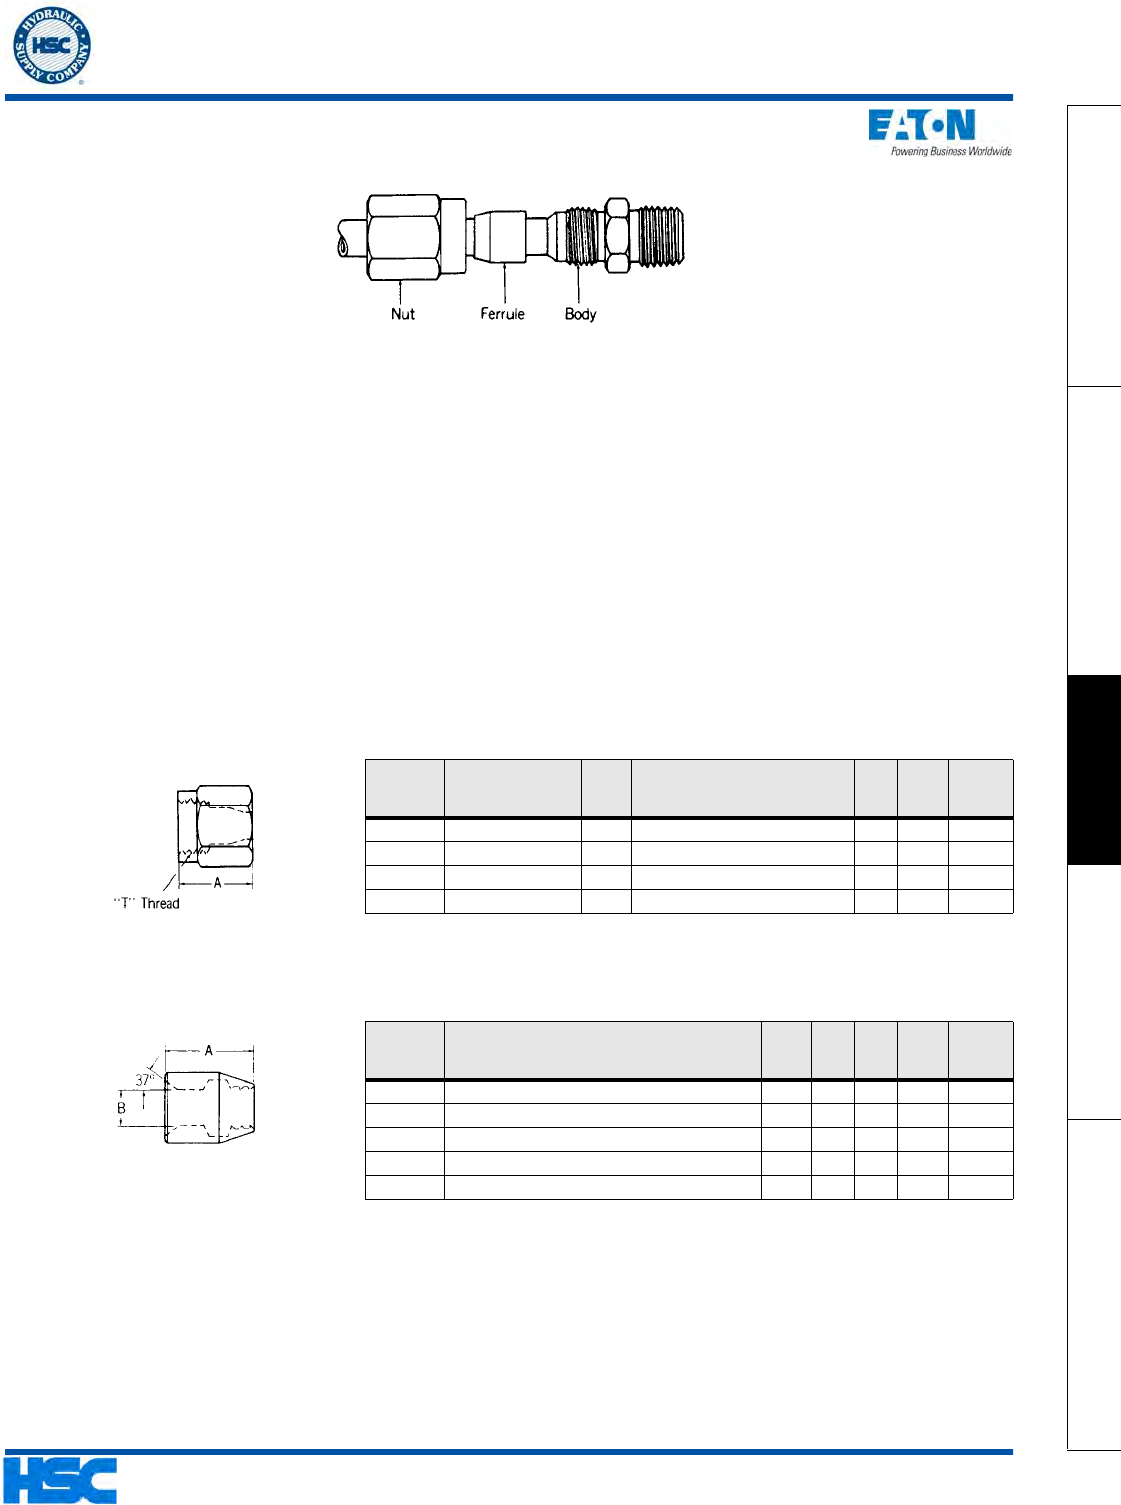 Long Nut Eaton Weatherhead 41X8 Brass CA360 SAE 45 Degree Flare 1//2 Tube OD